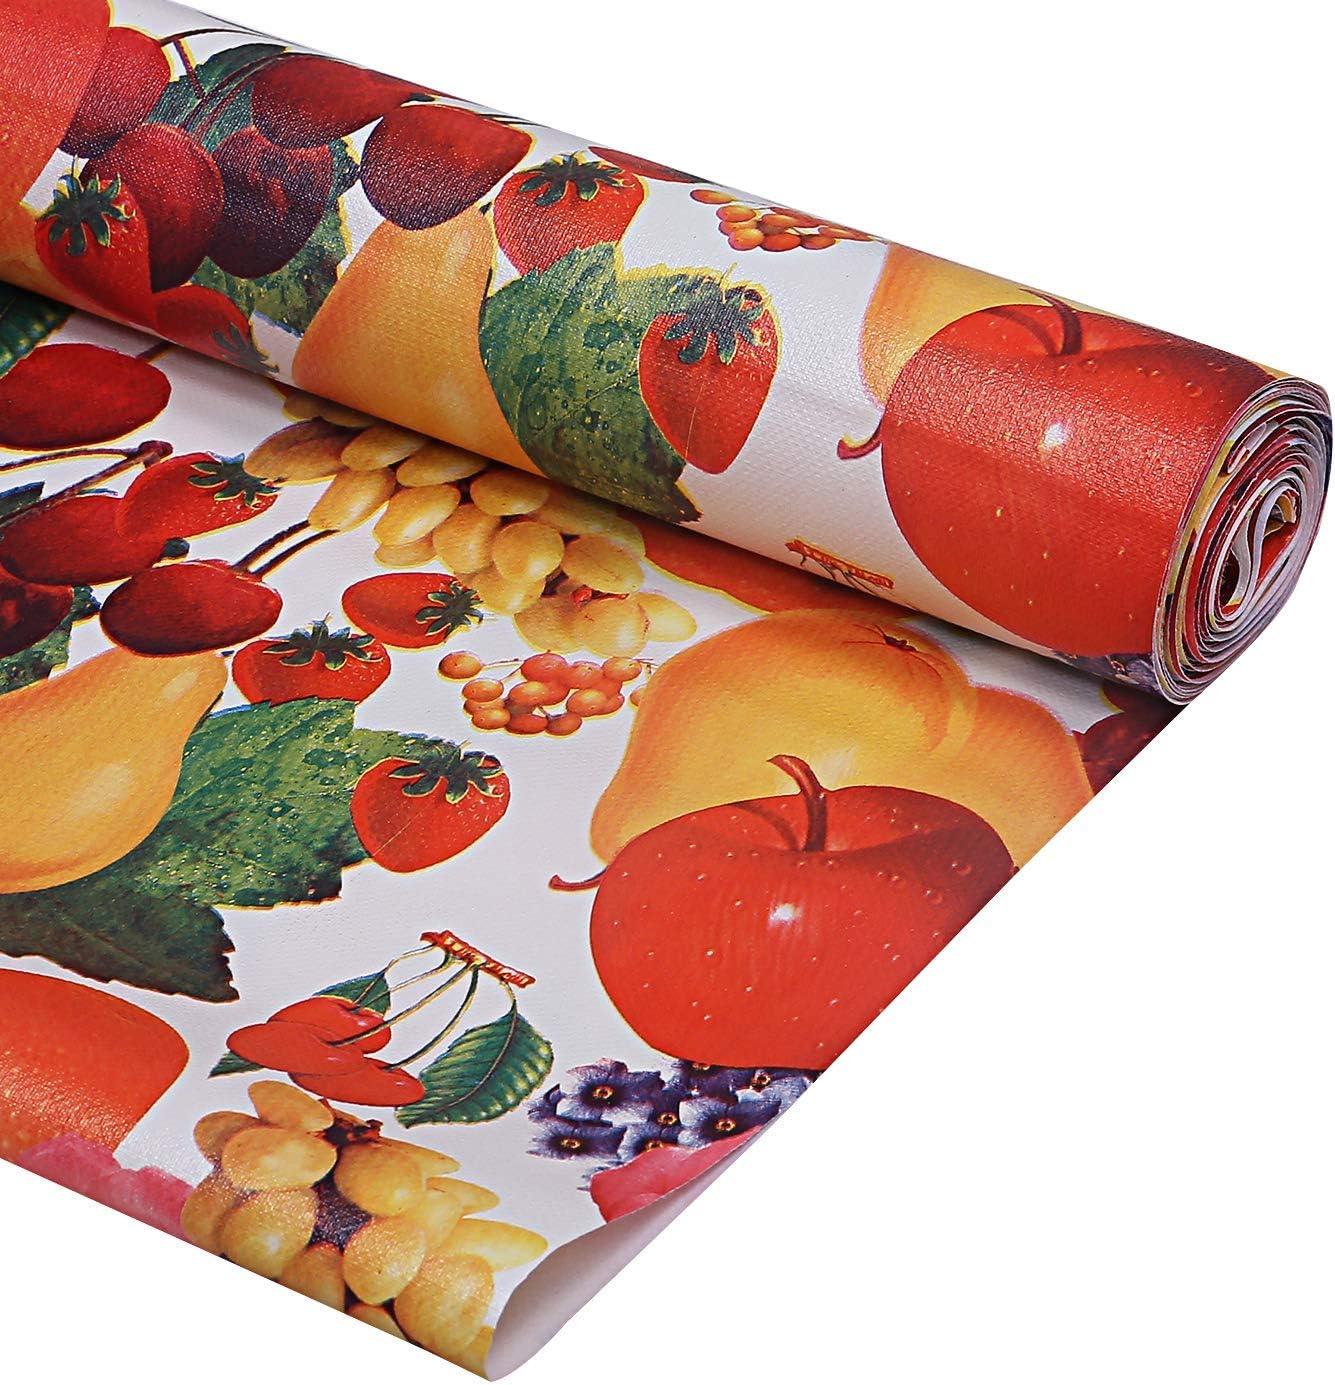 Kuber Quality inspection Industries Flower Design Ranking TOP10 PVC Drawer Kitchen Wardrobe Cupbo